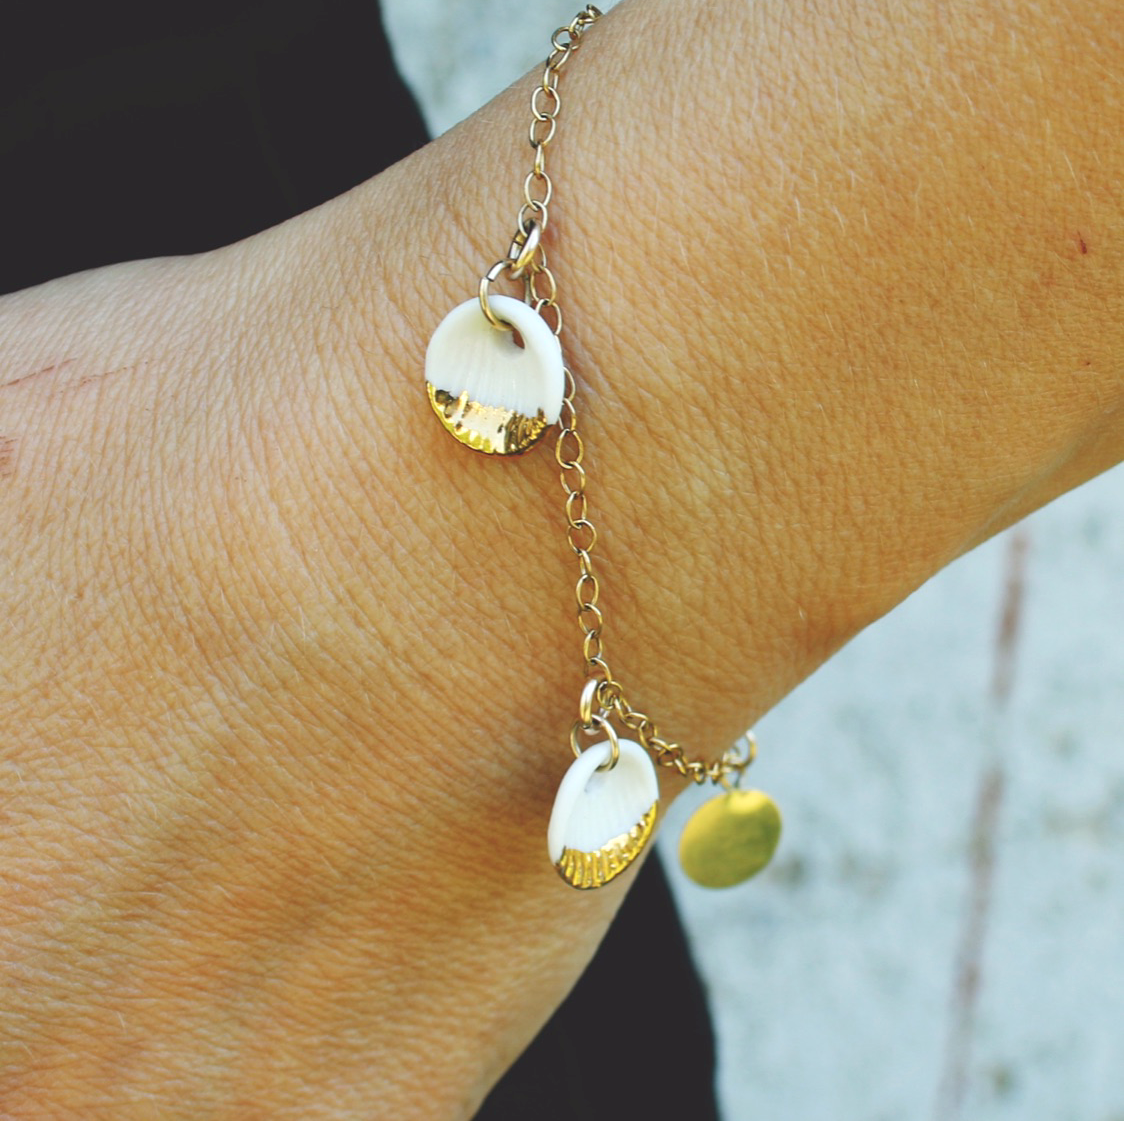 gold bracelet with white shells made of porcelain